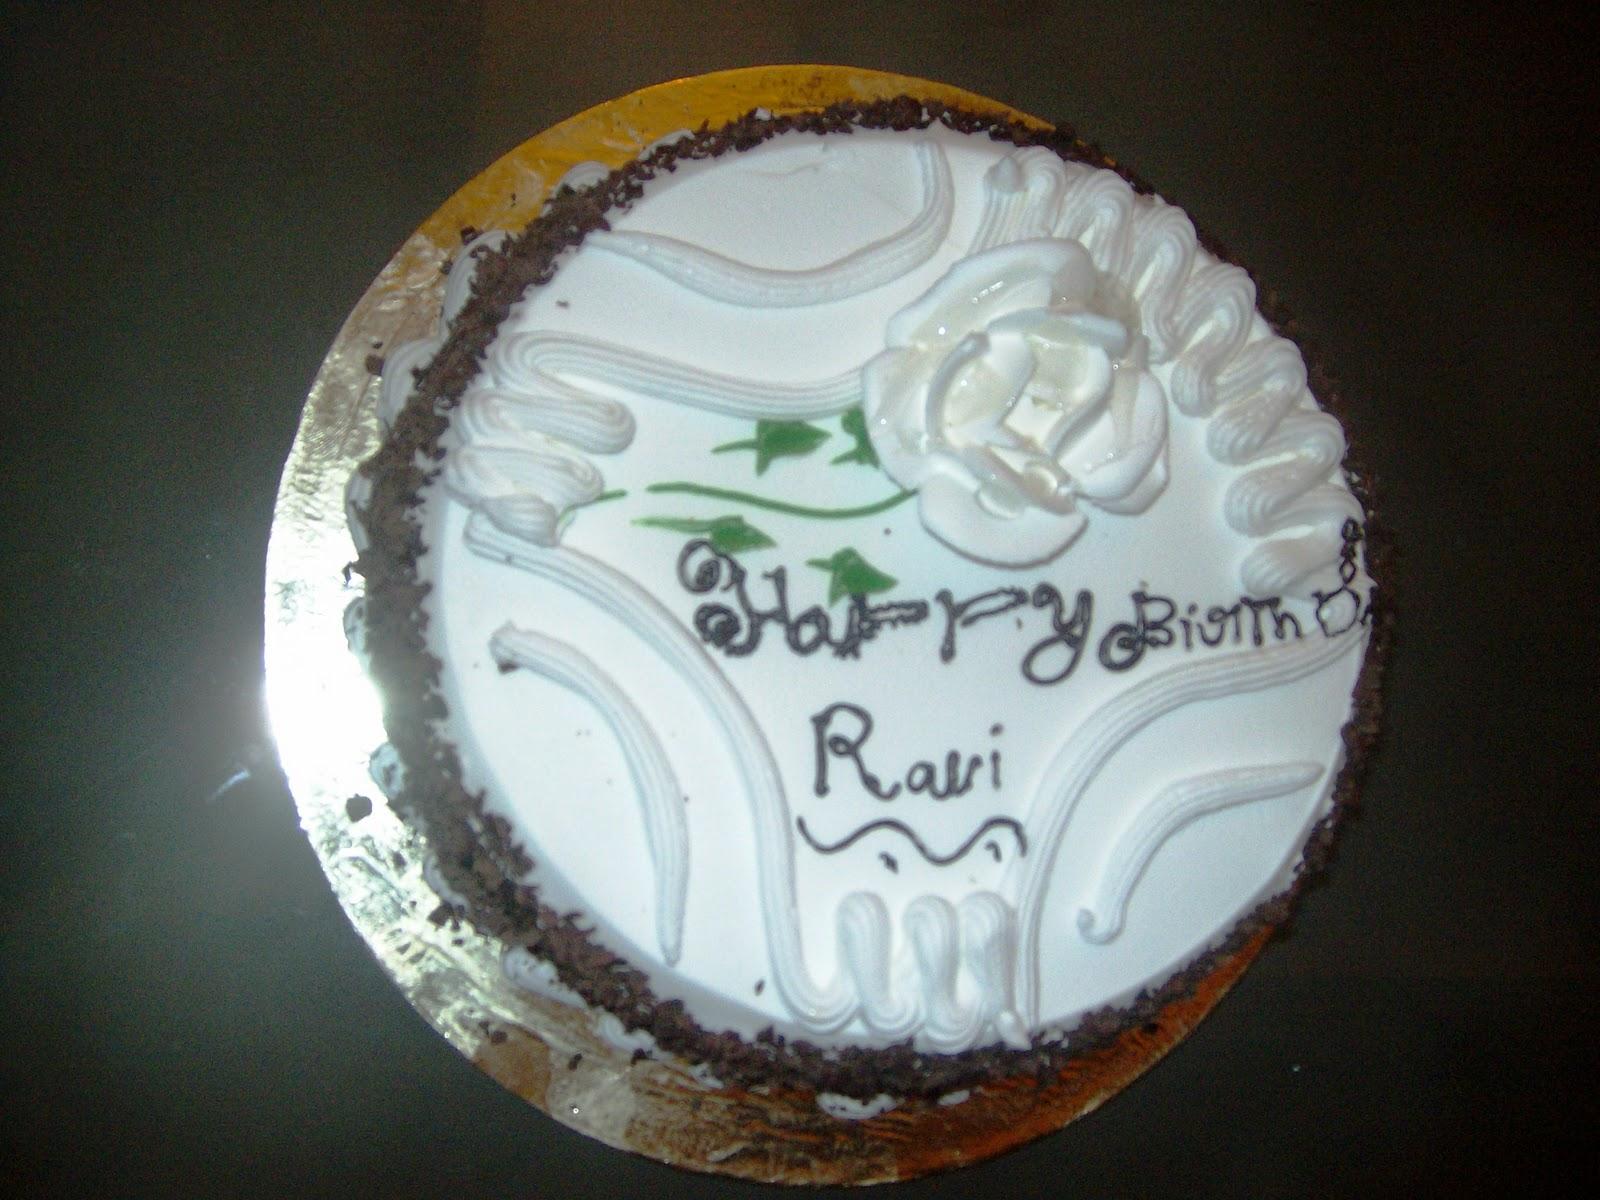 Cake Images Ravi : MEMOIRS: RAVI HAPPY BIRTH DAY